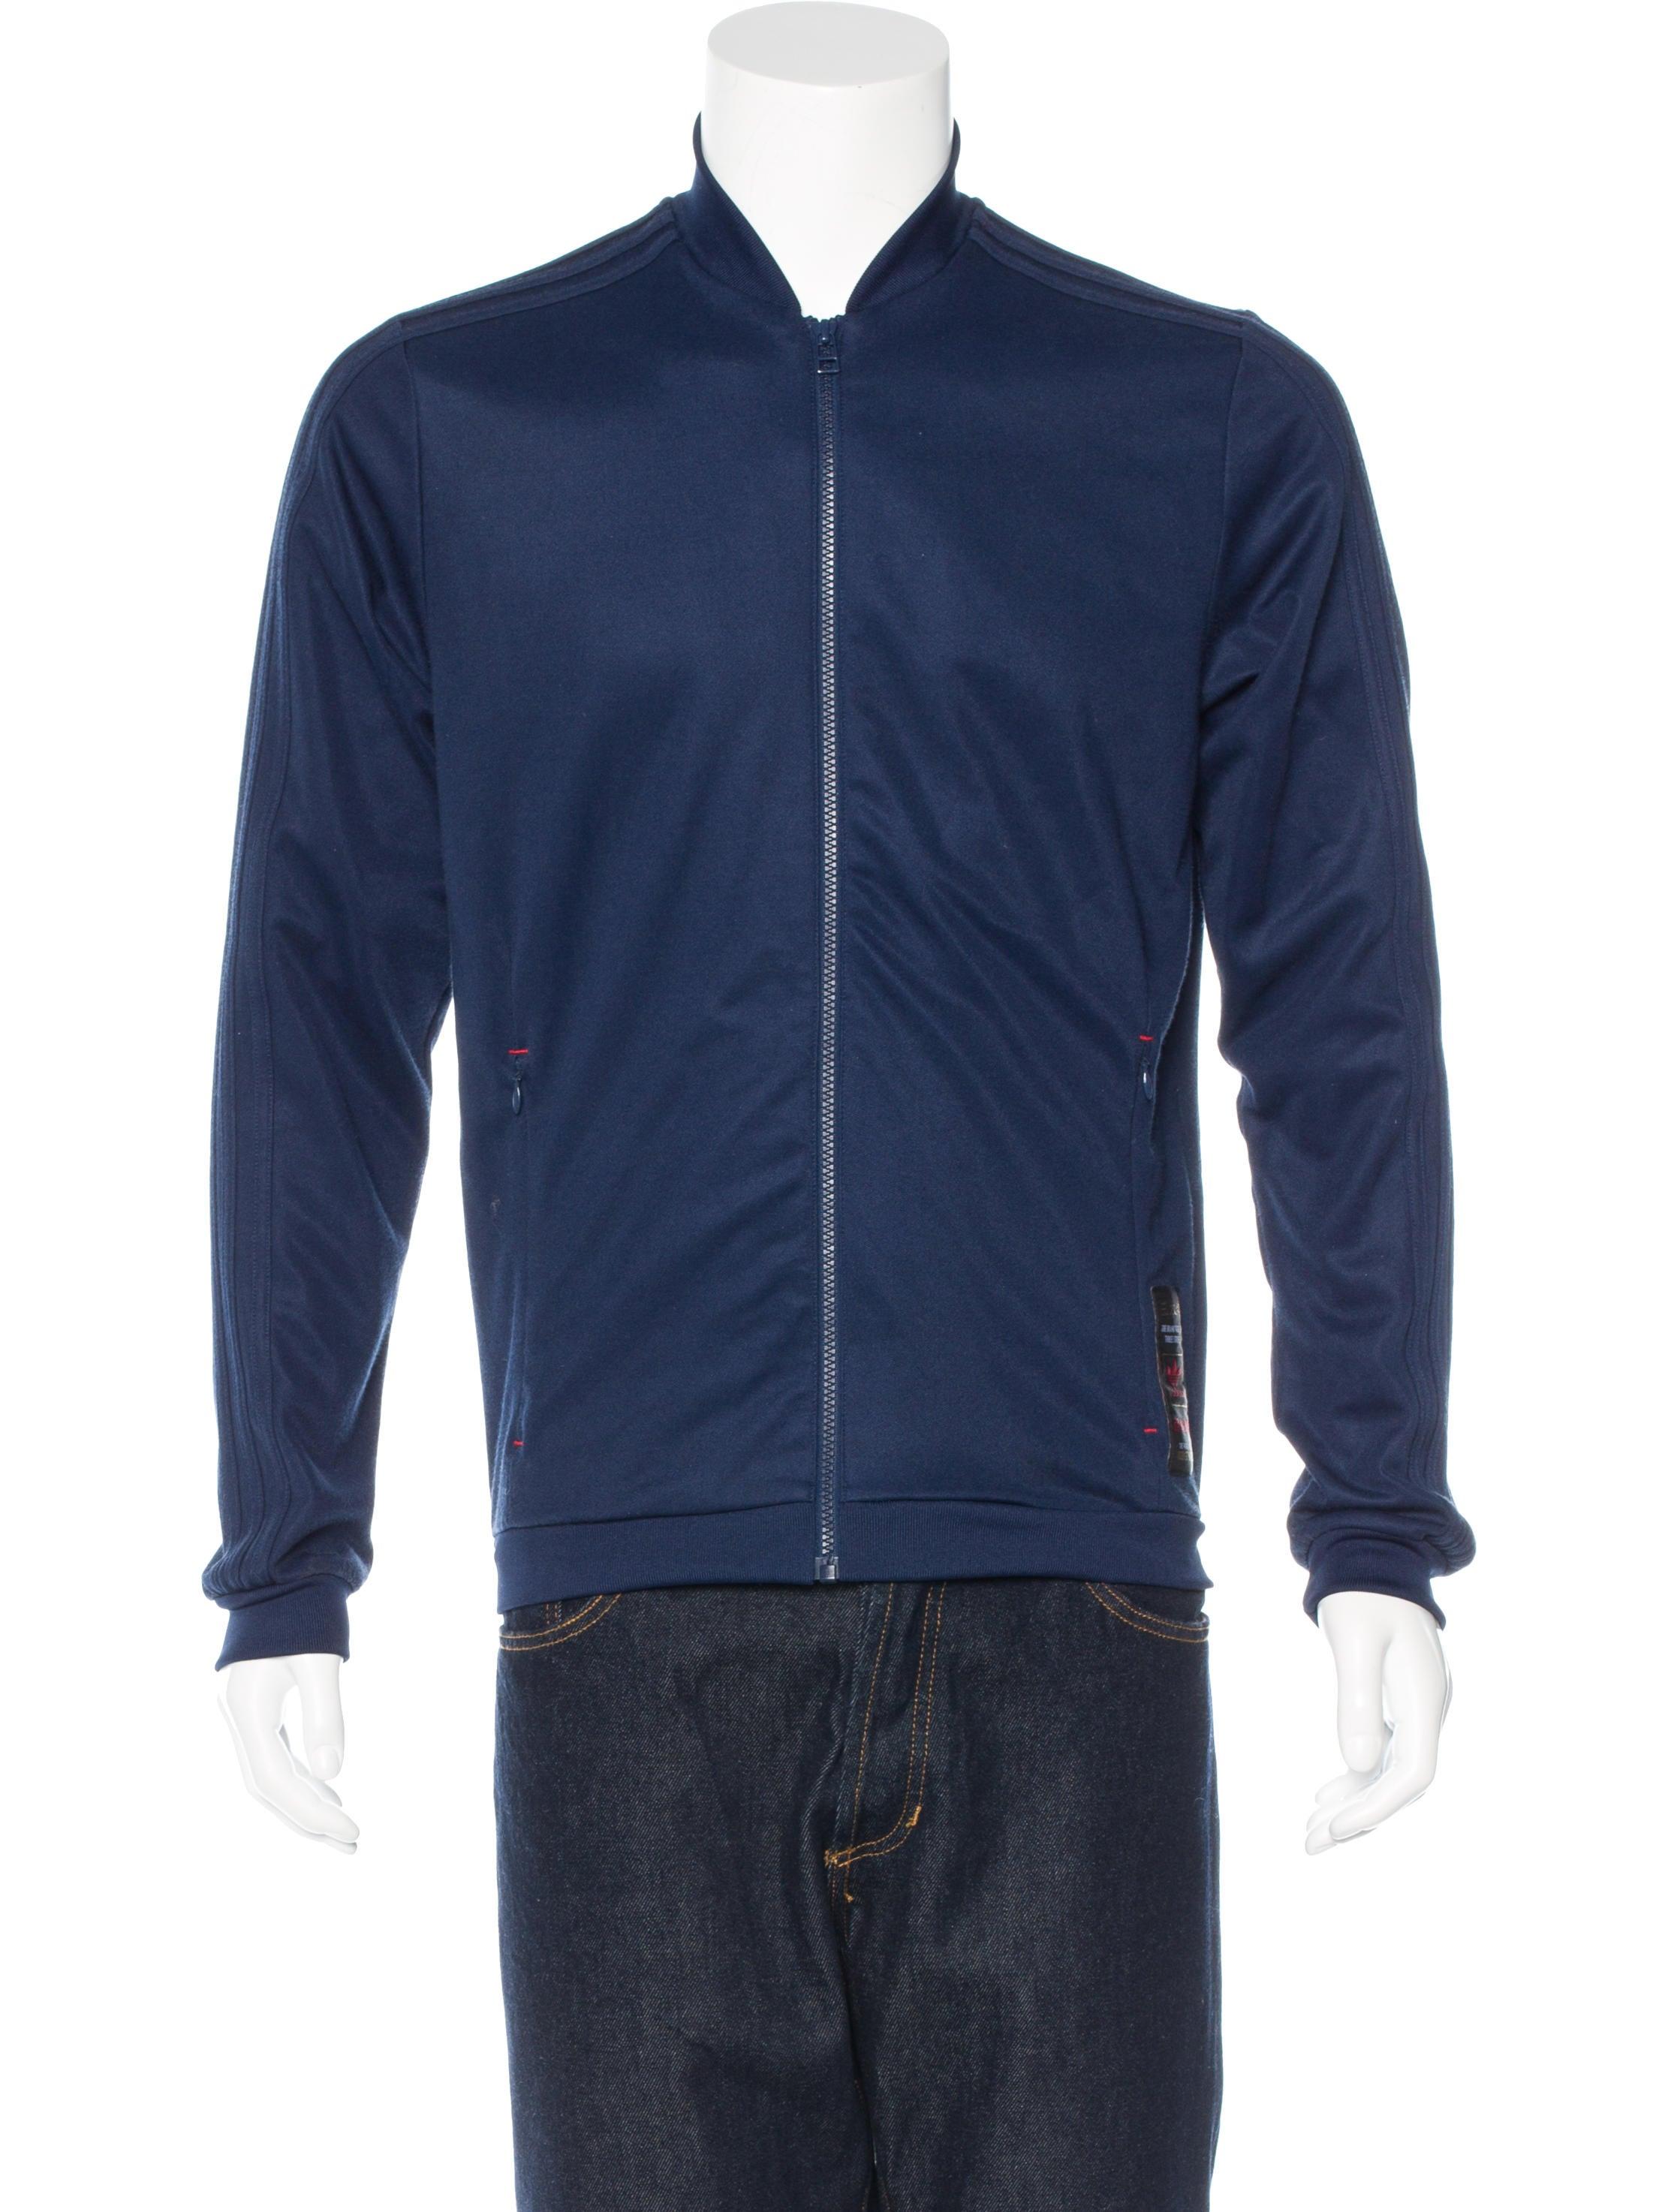 adidas retro track jacket adidas store shop adidas for. Black Bedroom Furniture Sets. Home Design Ideas